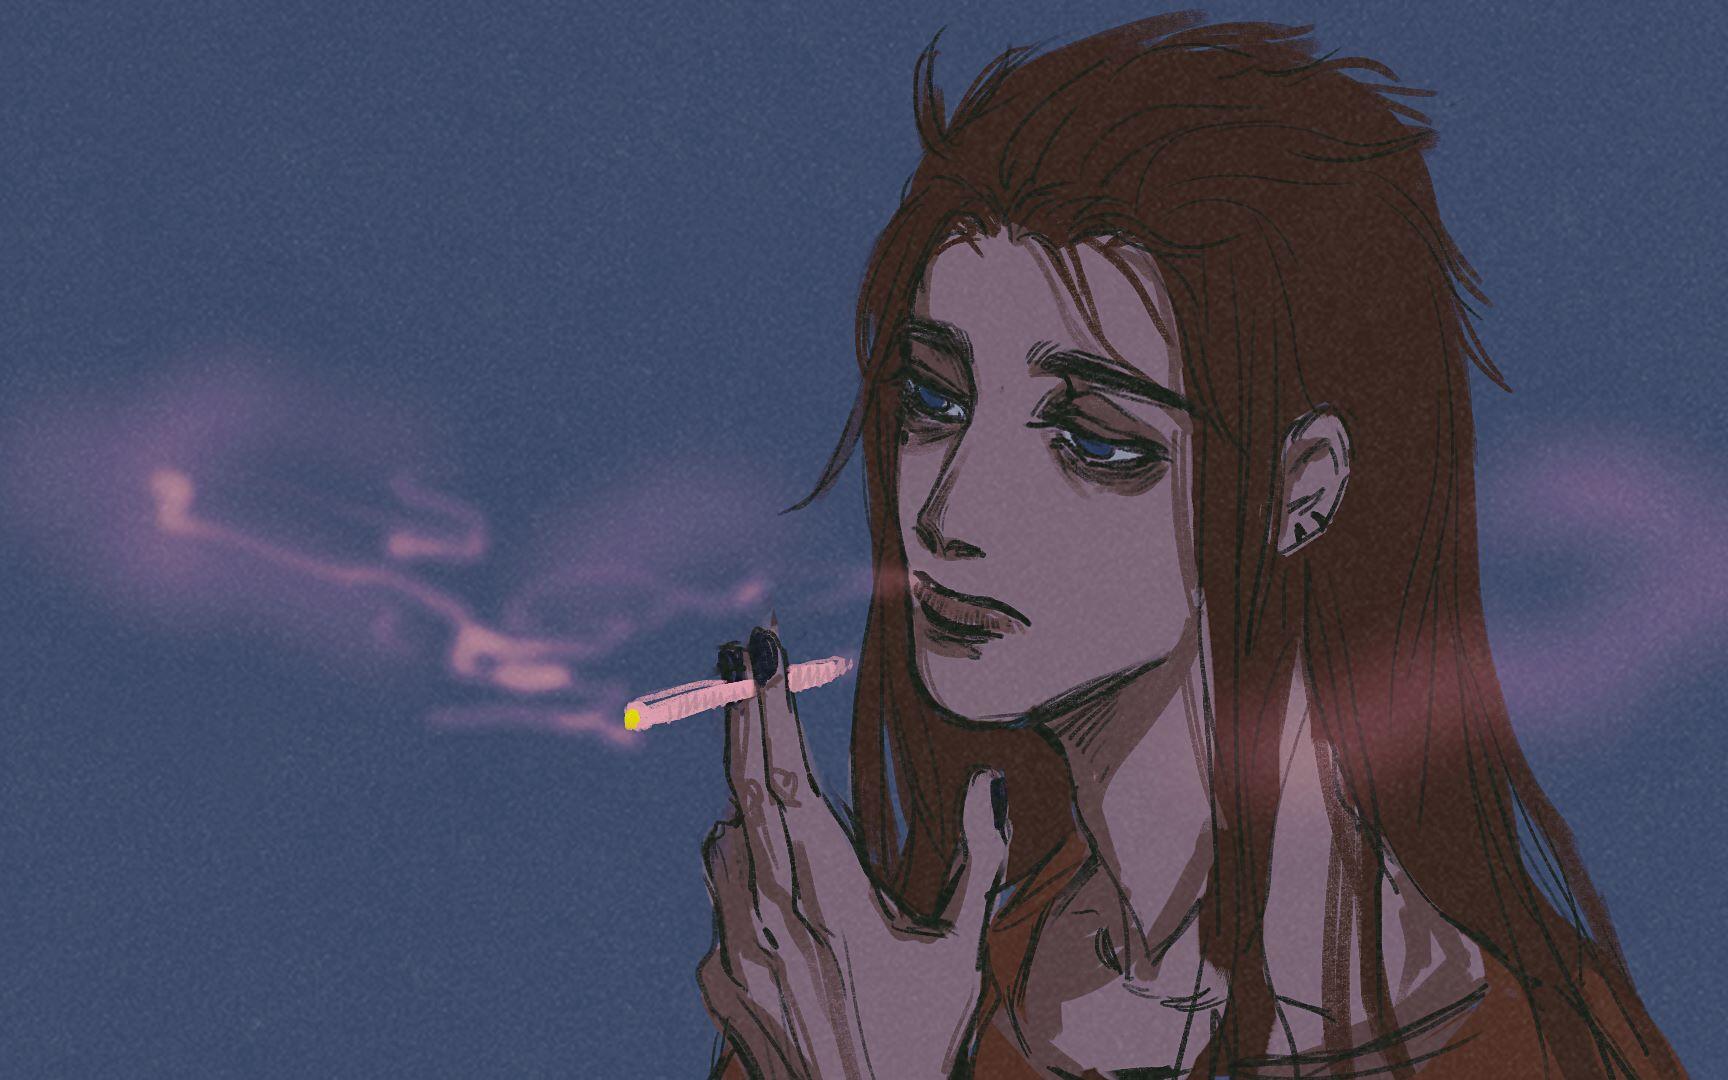 妇女���-yf�j8i��n片_【sally face手书 / ls cp向】f.e.e.l.i.n.g.c.a.l.l.e.d.l.o.v.